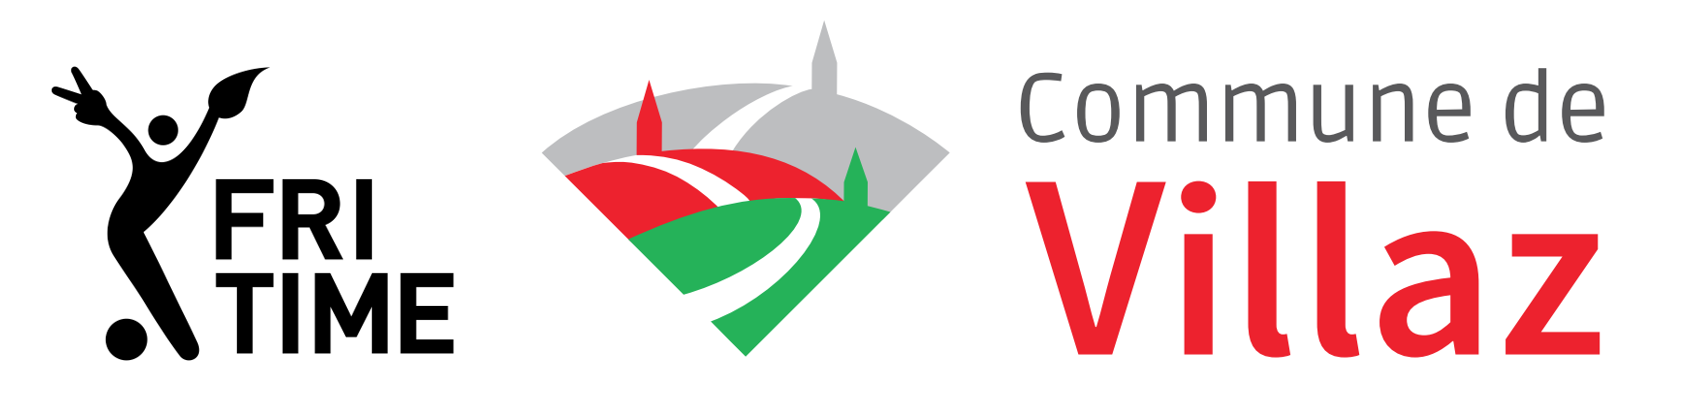 logo fritime villaz